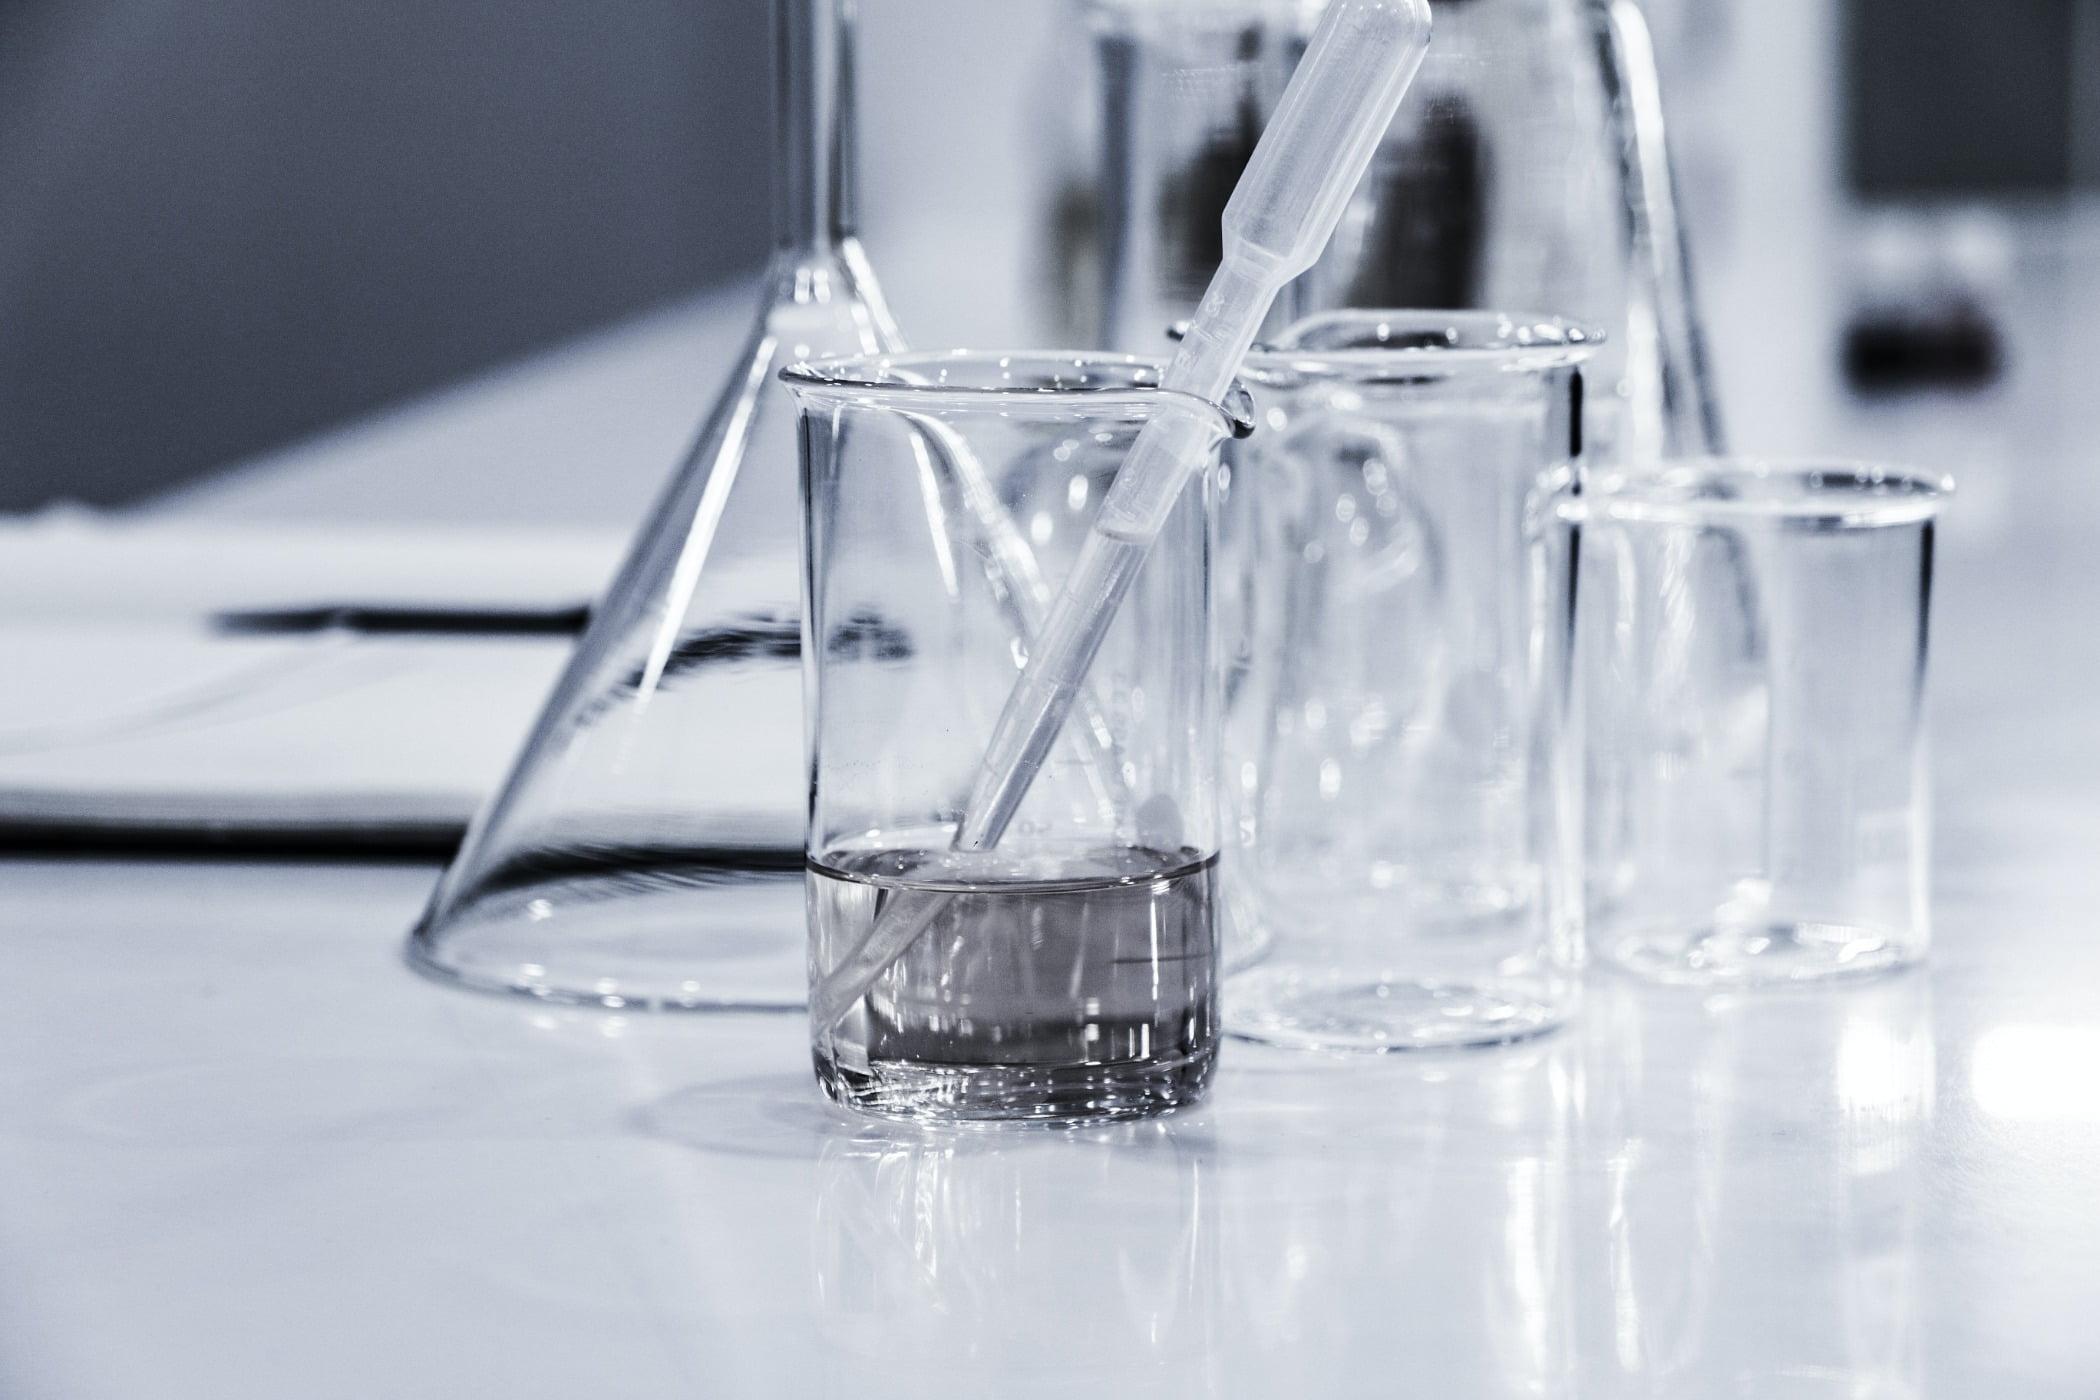 Champagne stemware, Tableware, Liquid, Drinkware, Table, Barware, Fluid, Black-and-white